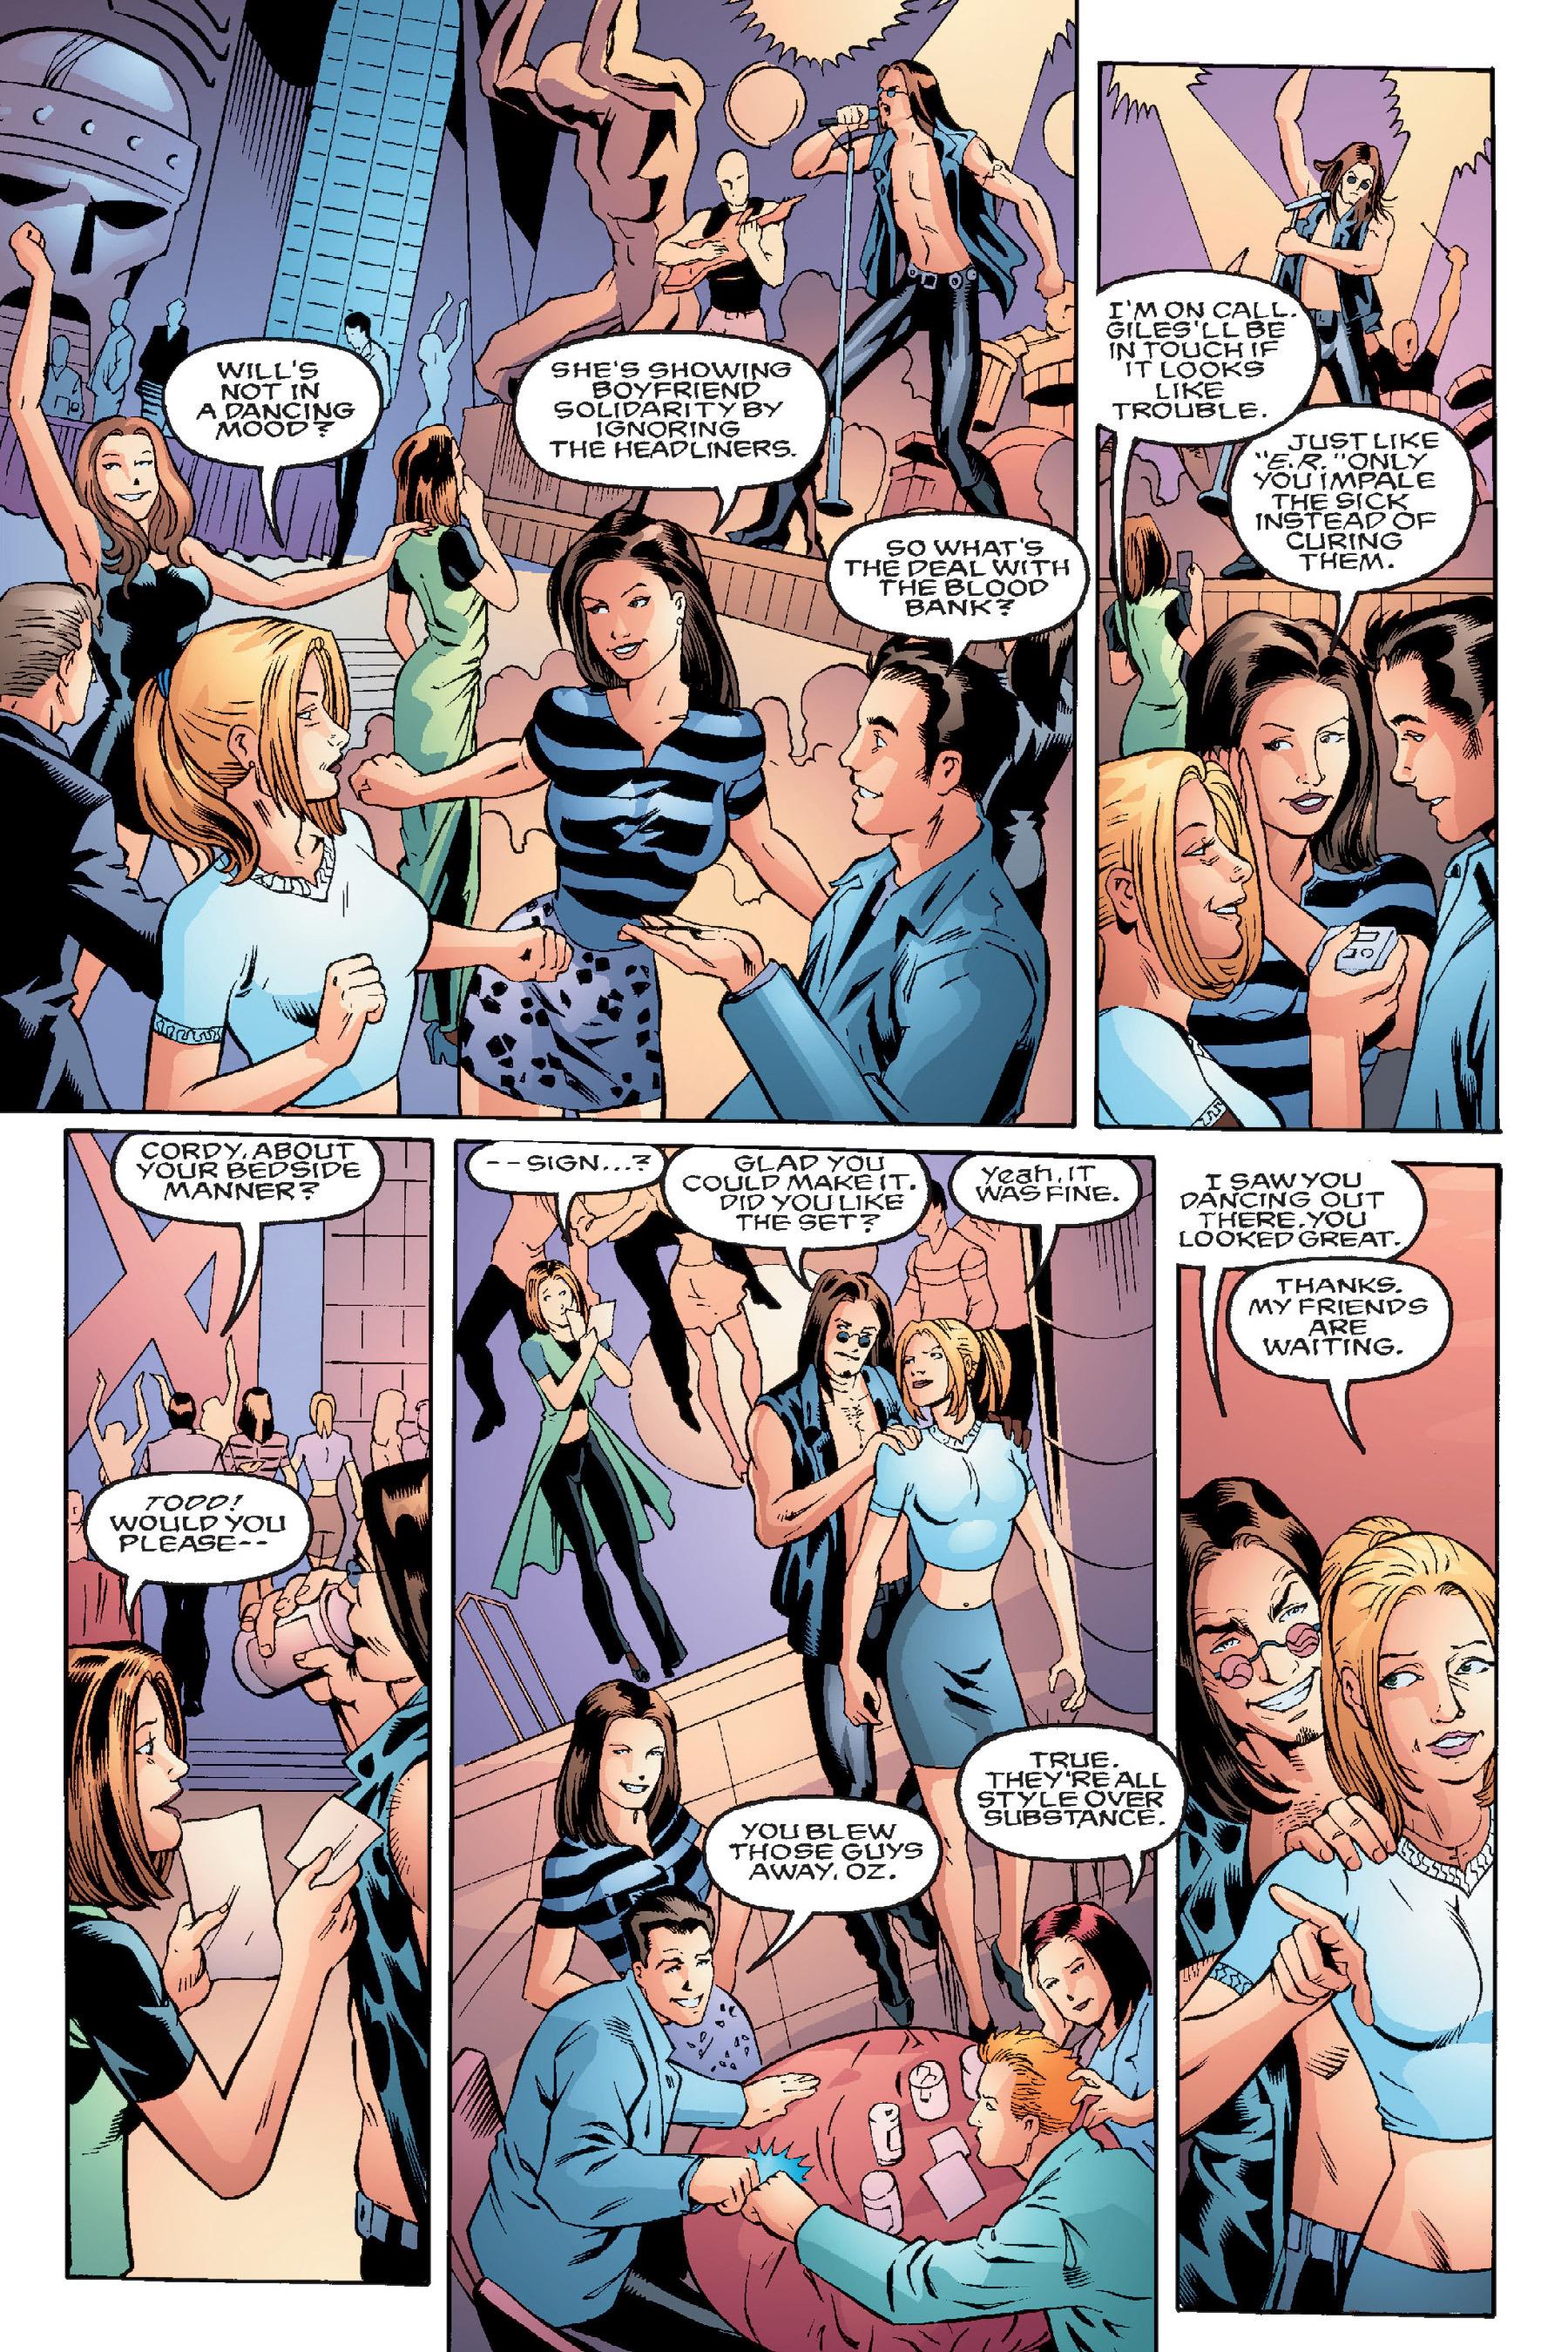 Read online Buffy the Vampire Slayer: Omnibus comic -  Issue # TPB 4 - 61